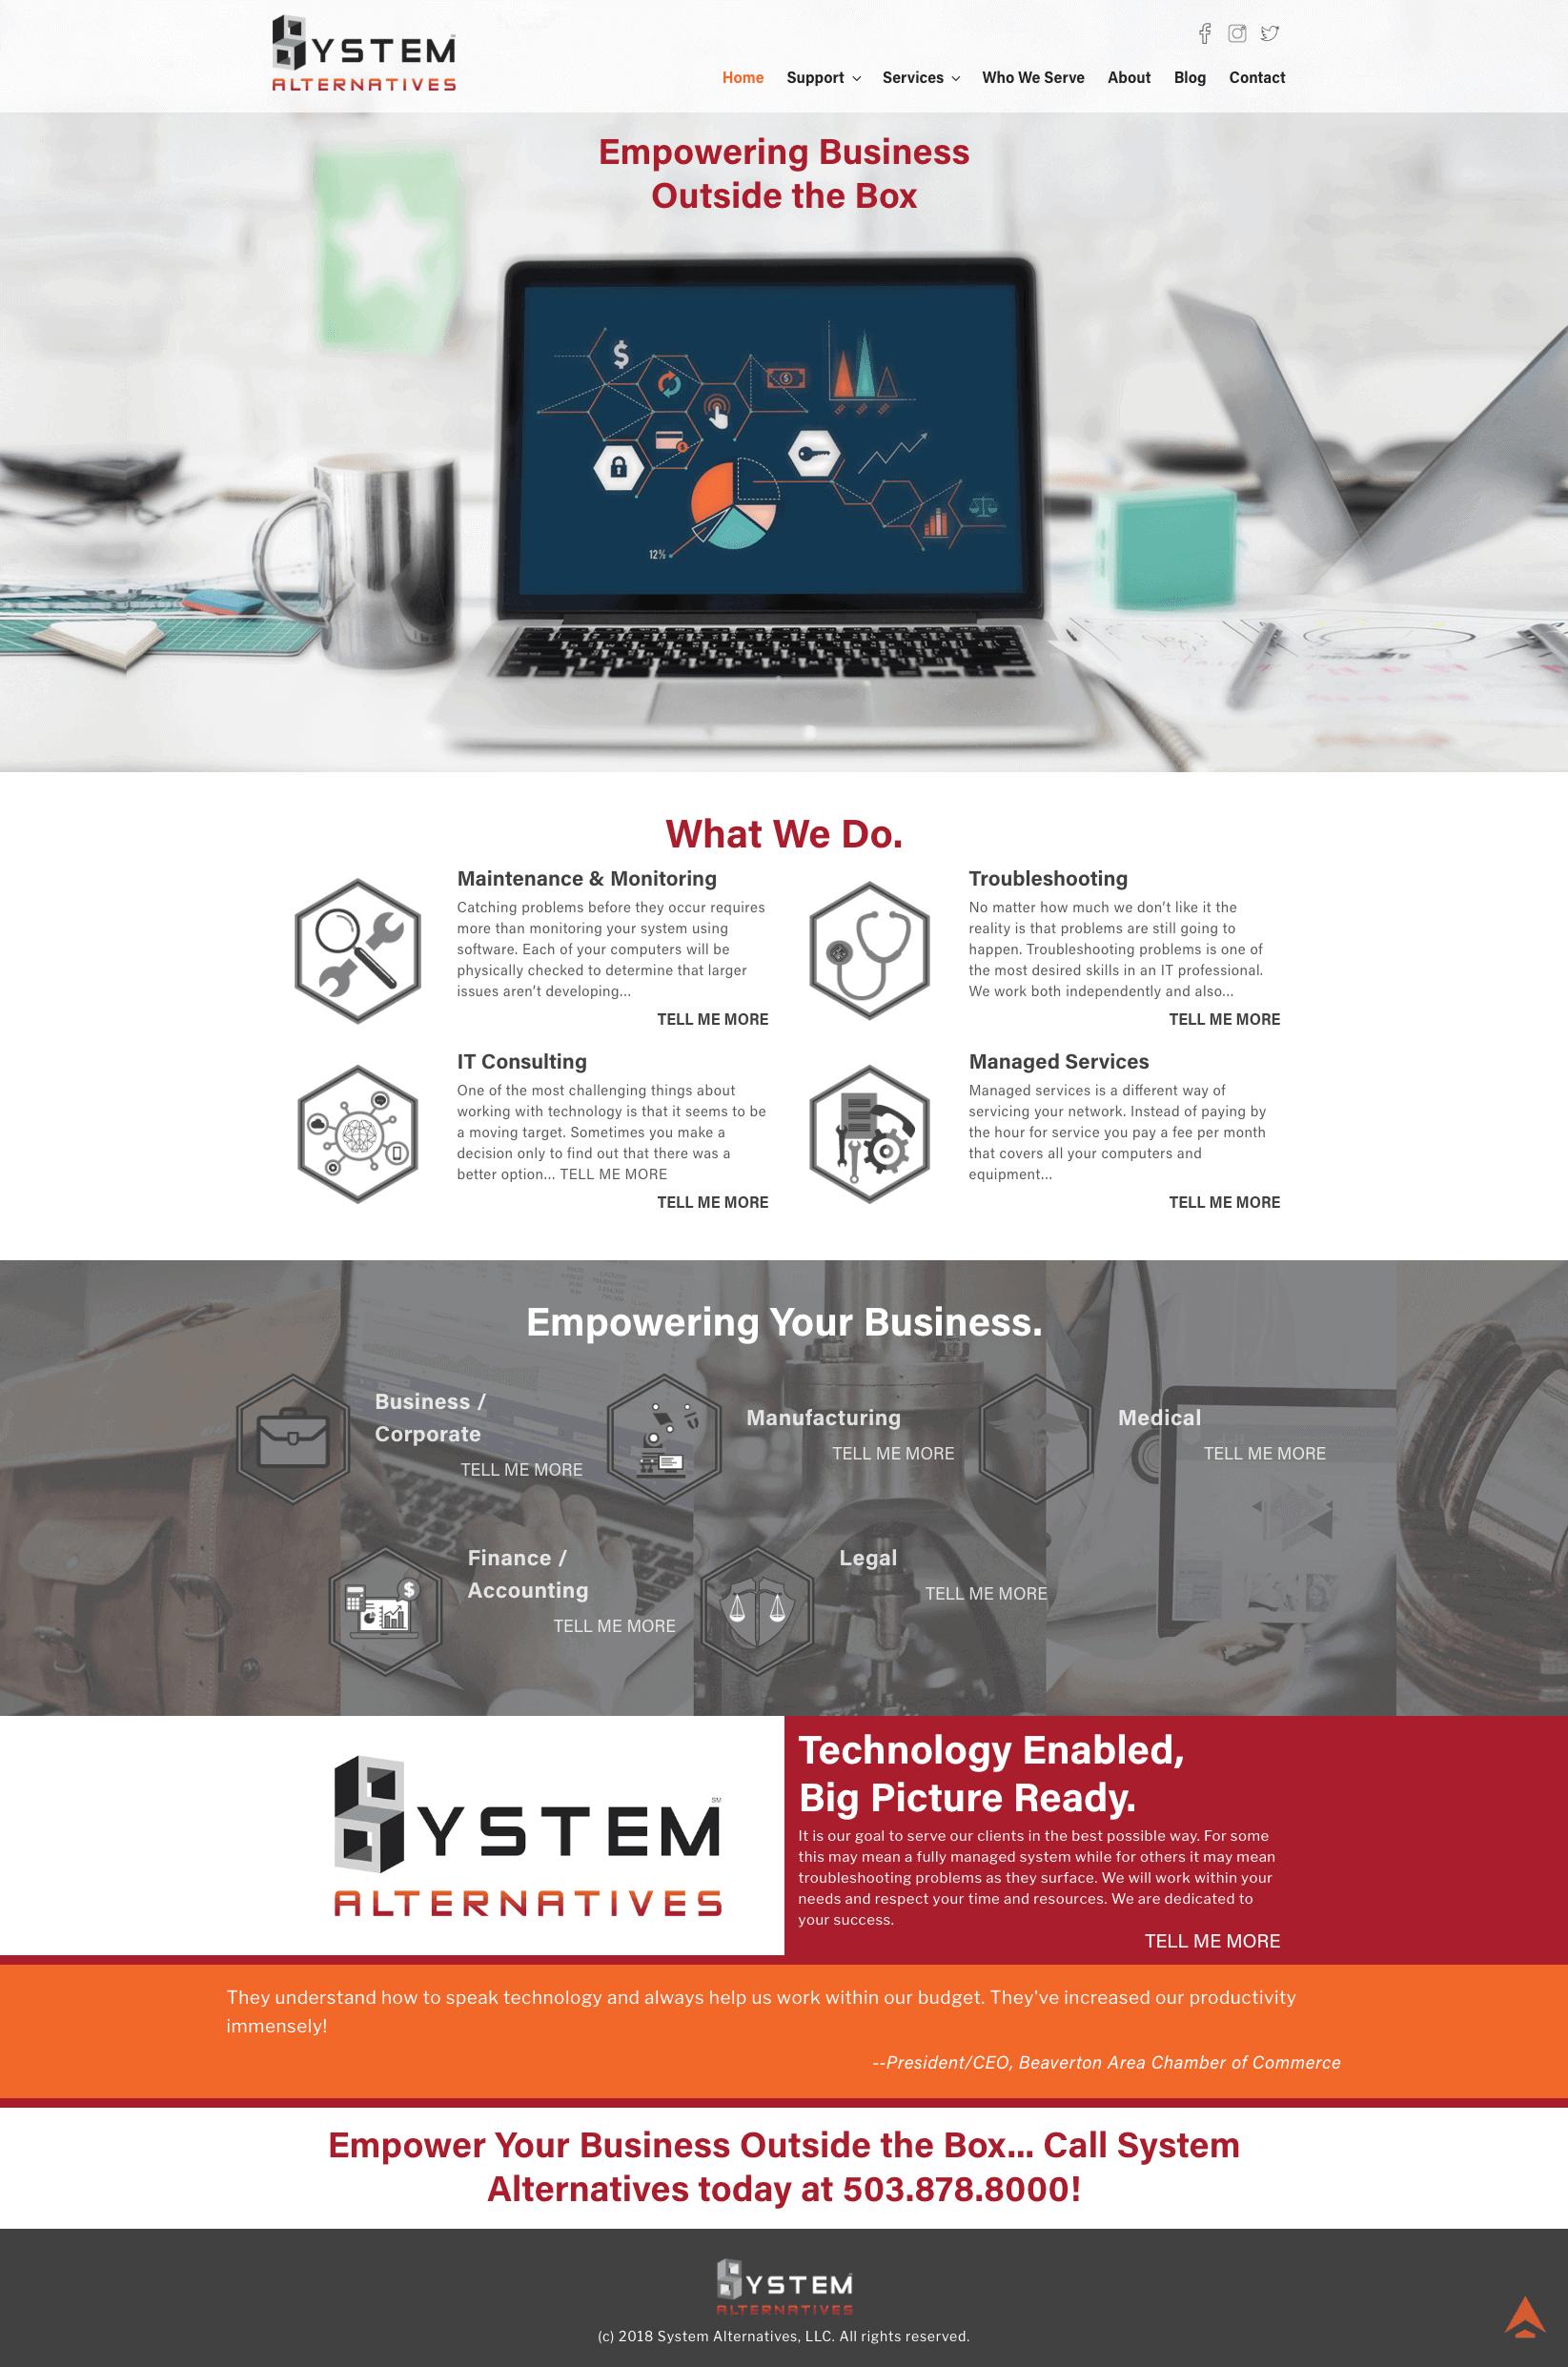 systemalt-full